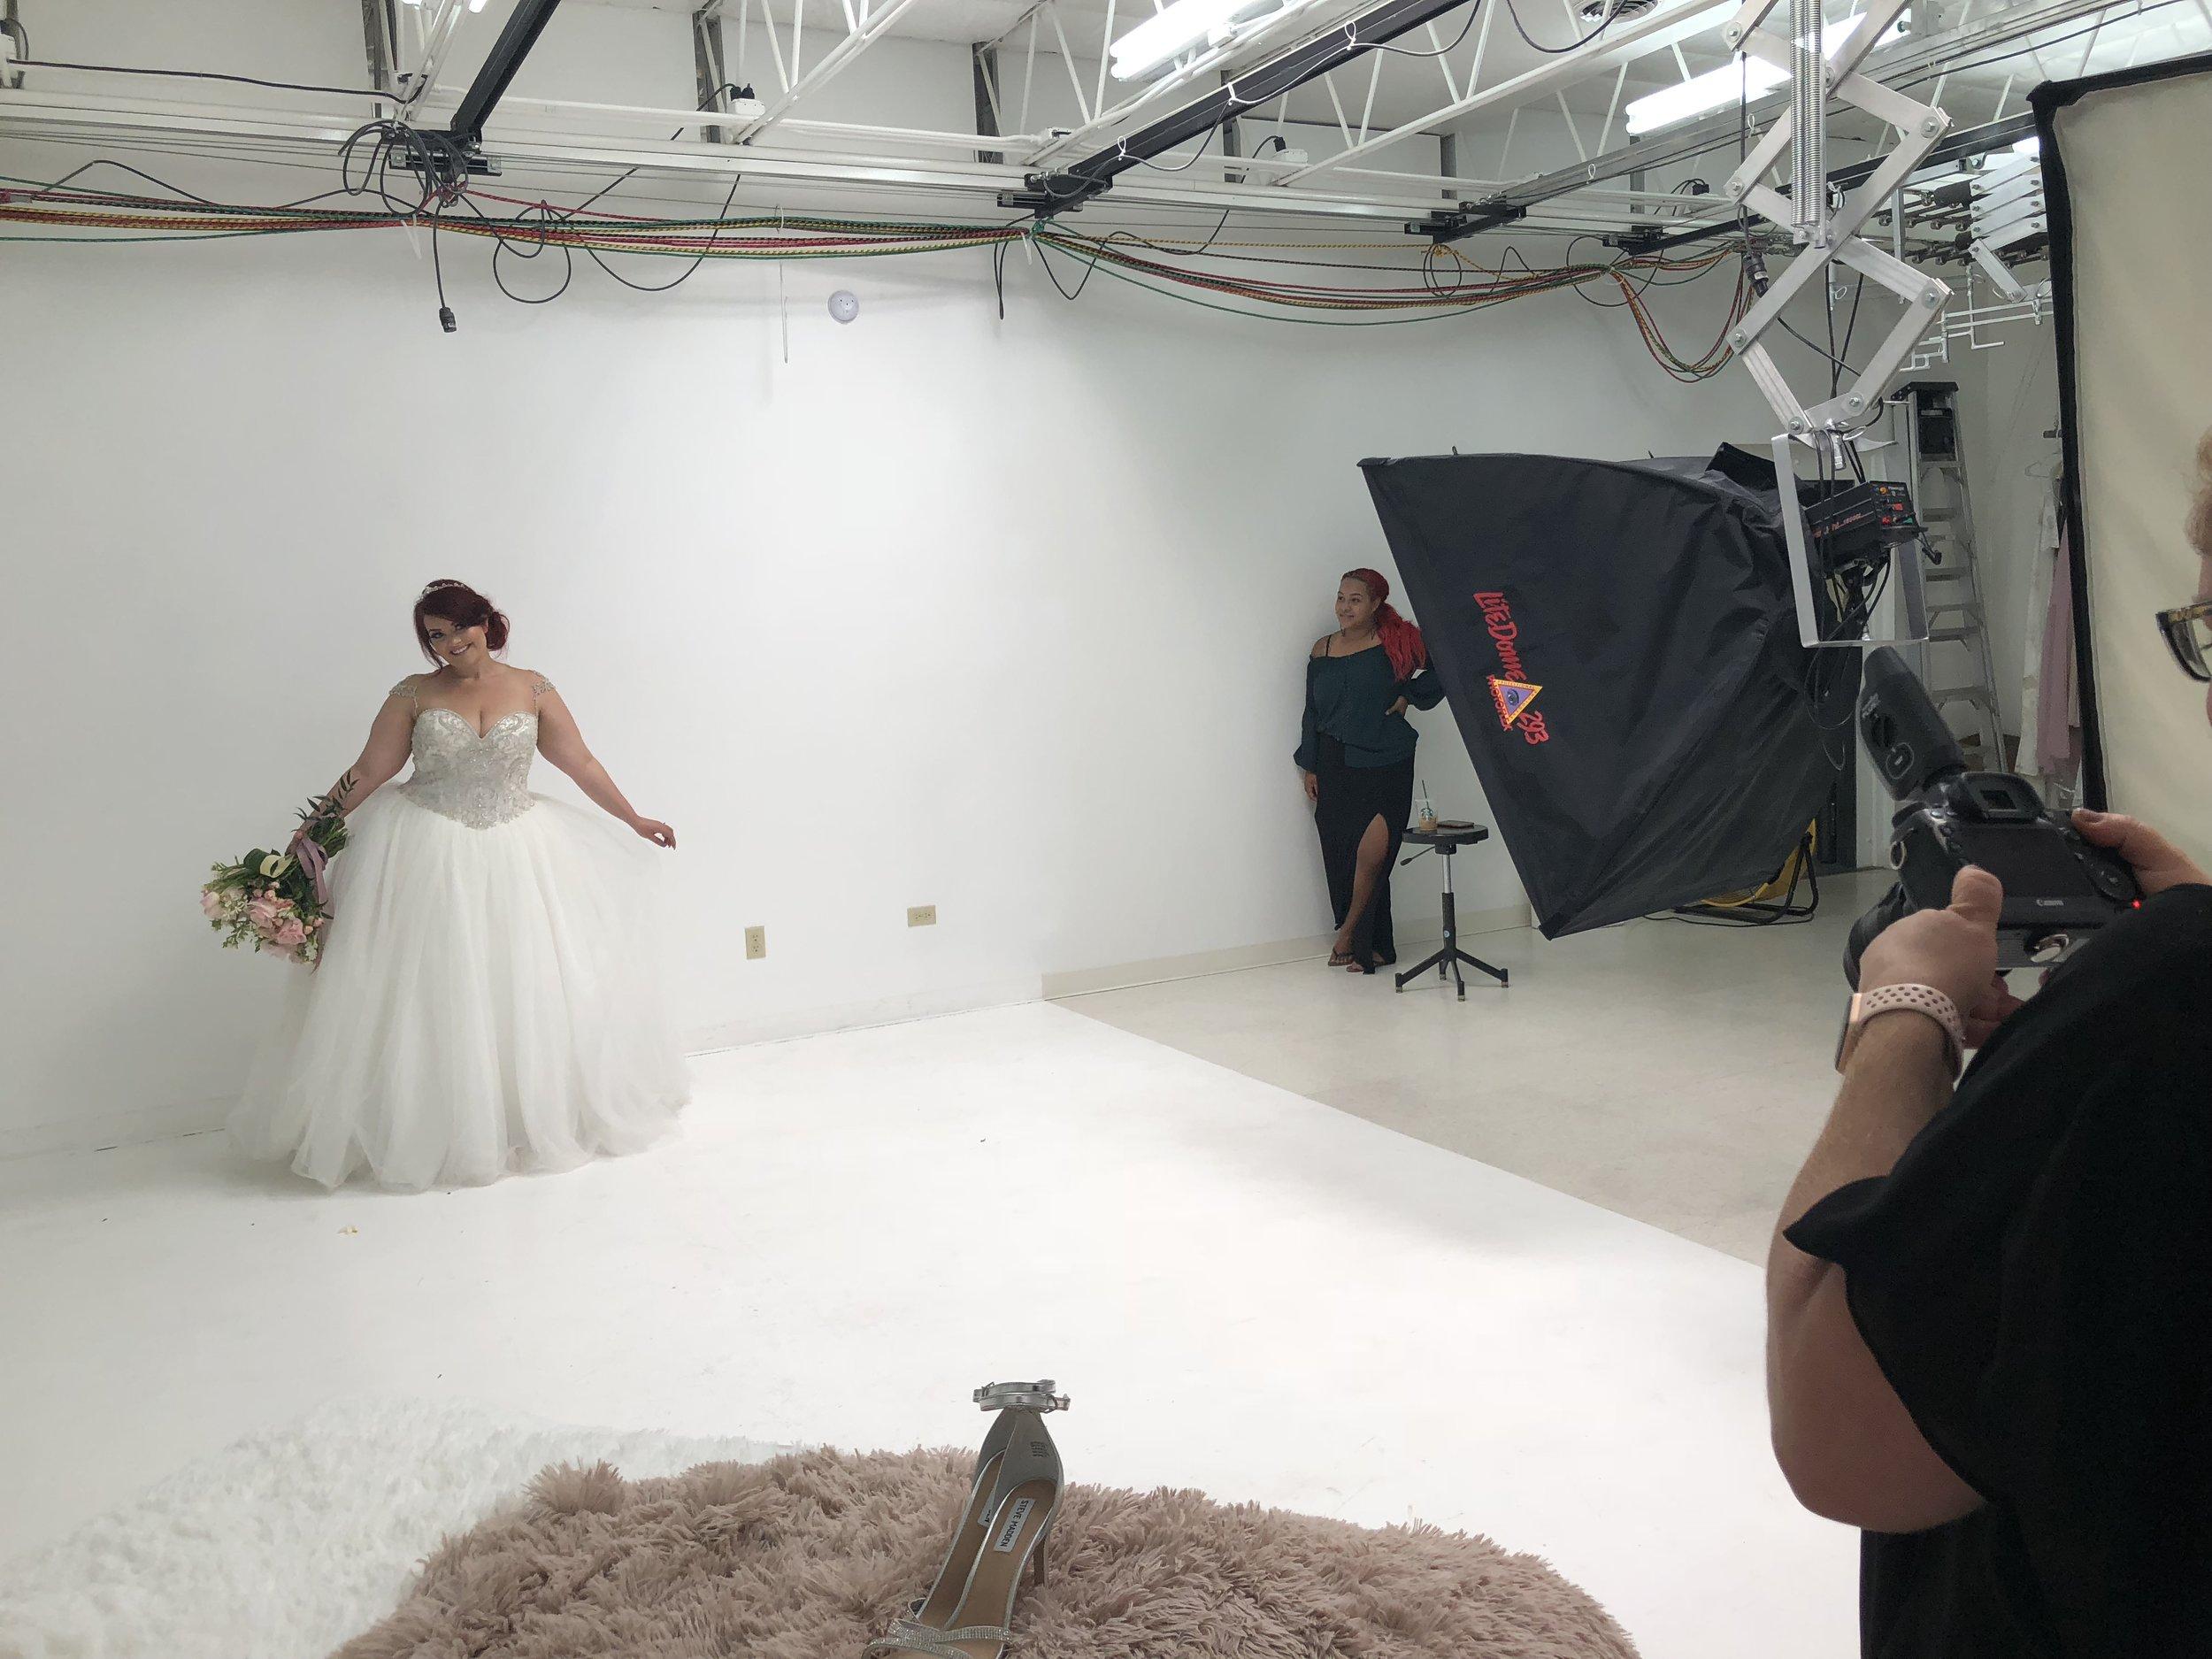 uptown Bride fashion shoot 4.jpg